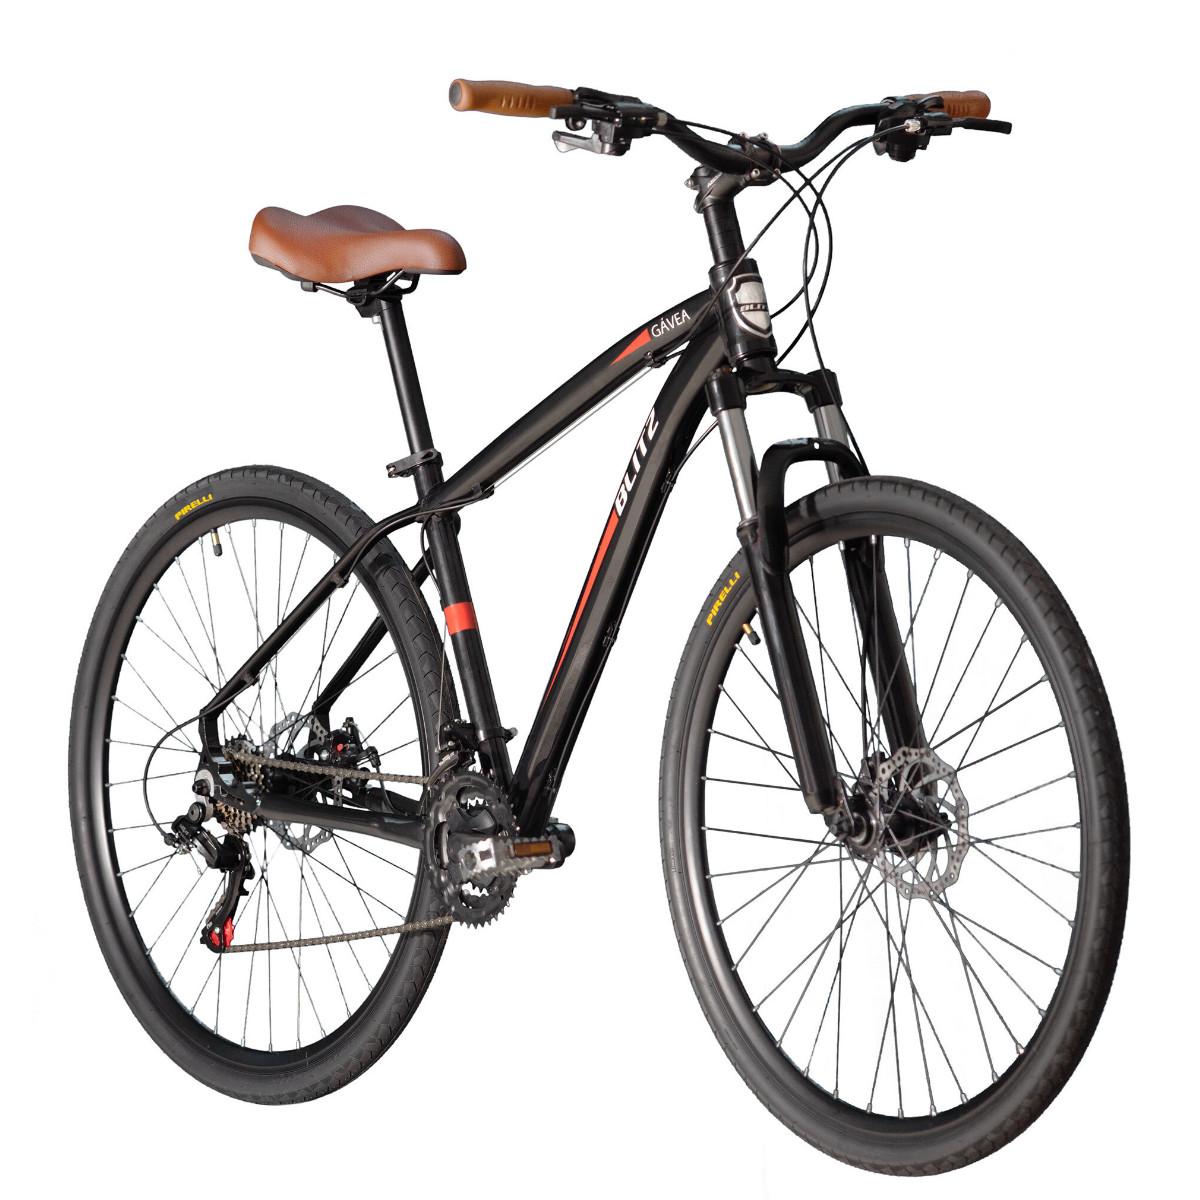 Bicicleta Híbrida Blitz Gávea Aro 700 Disc